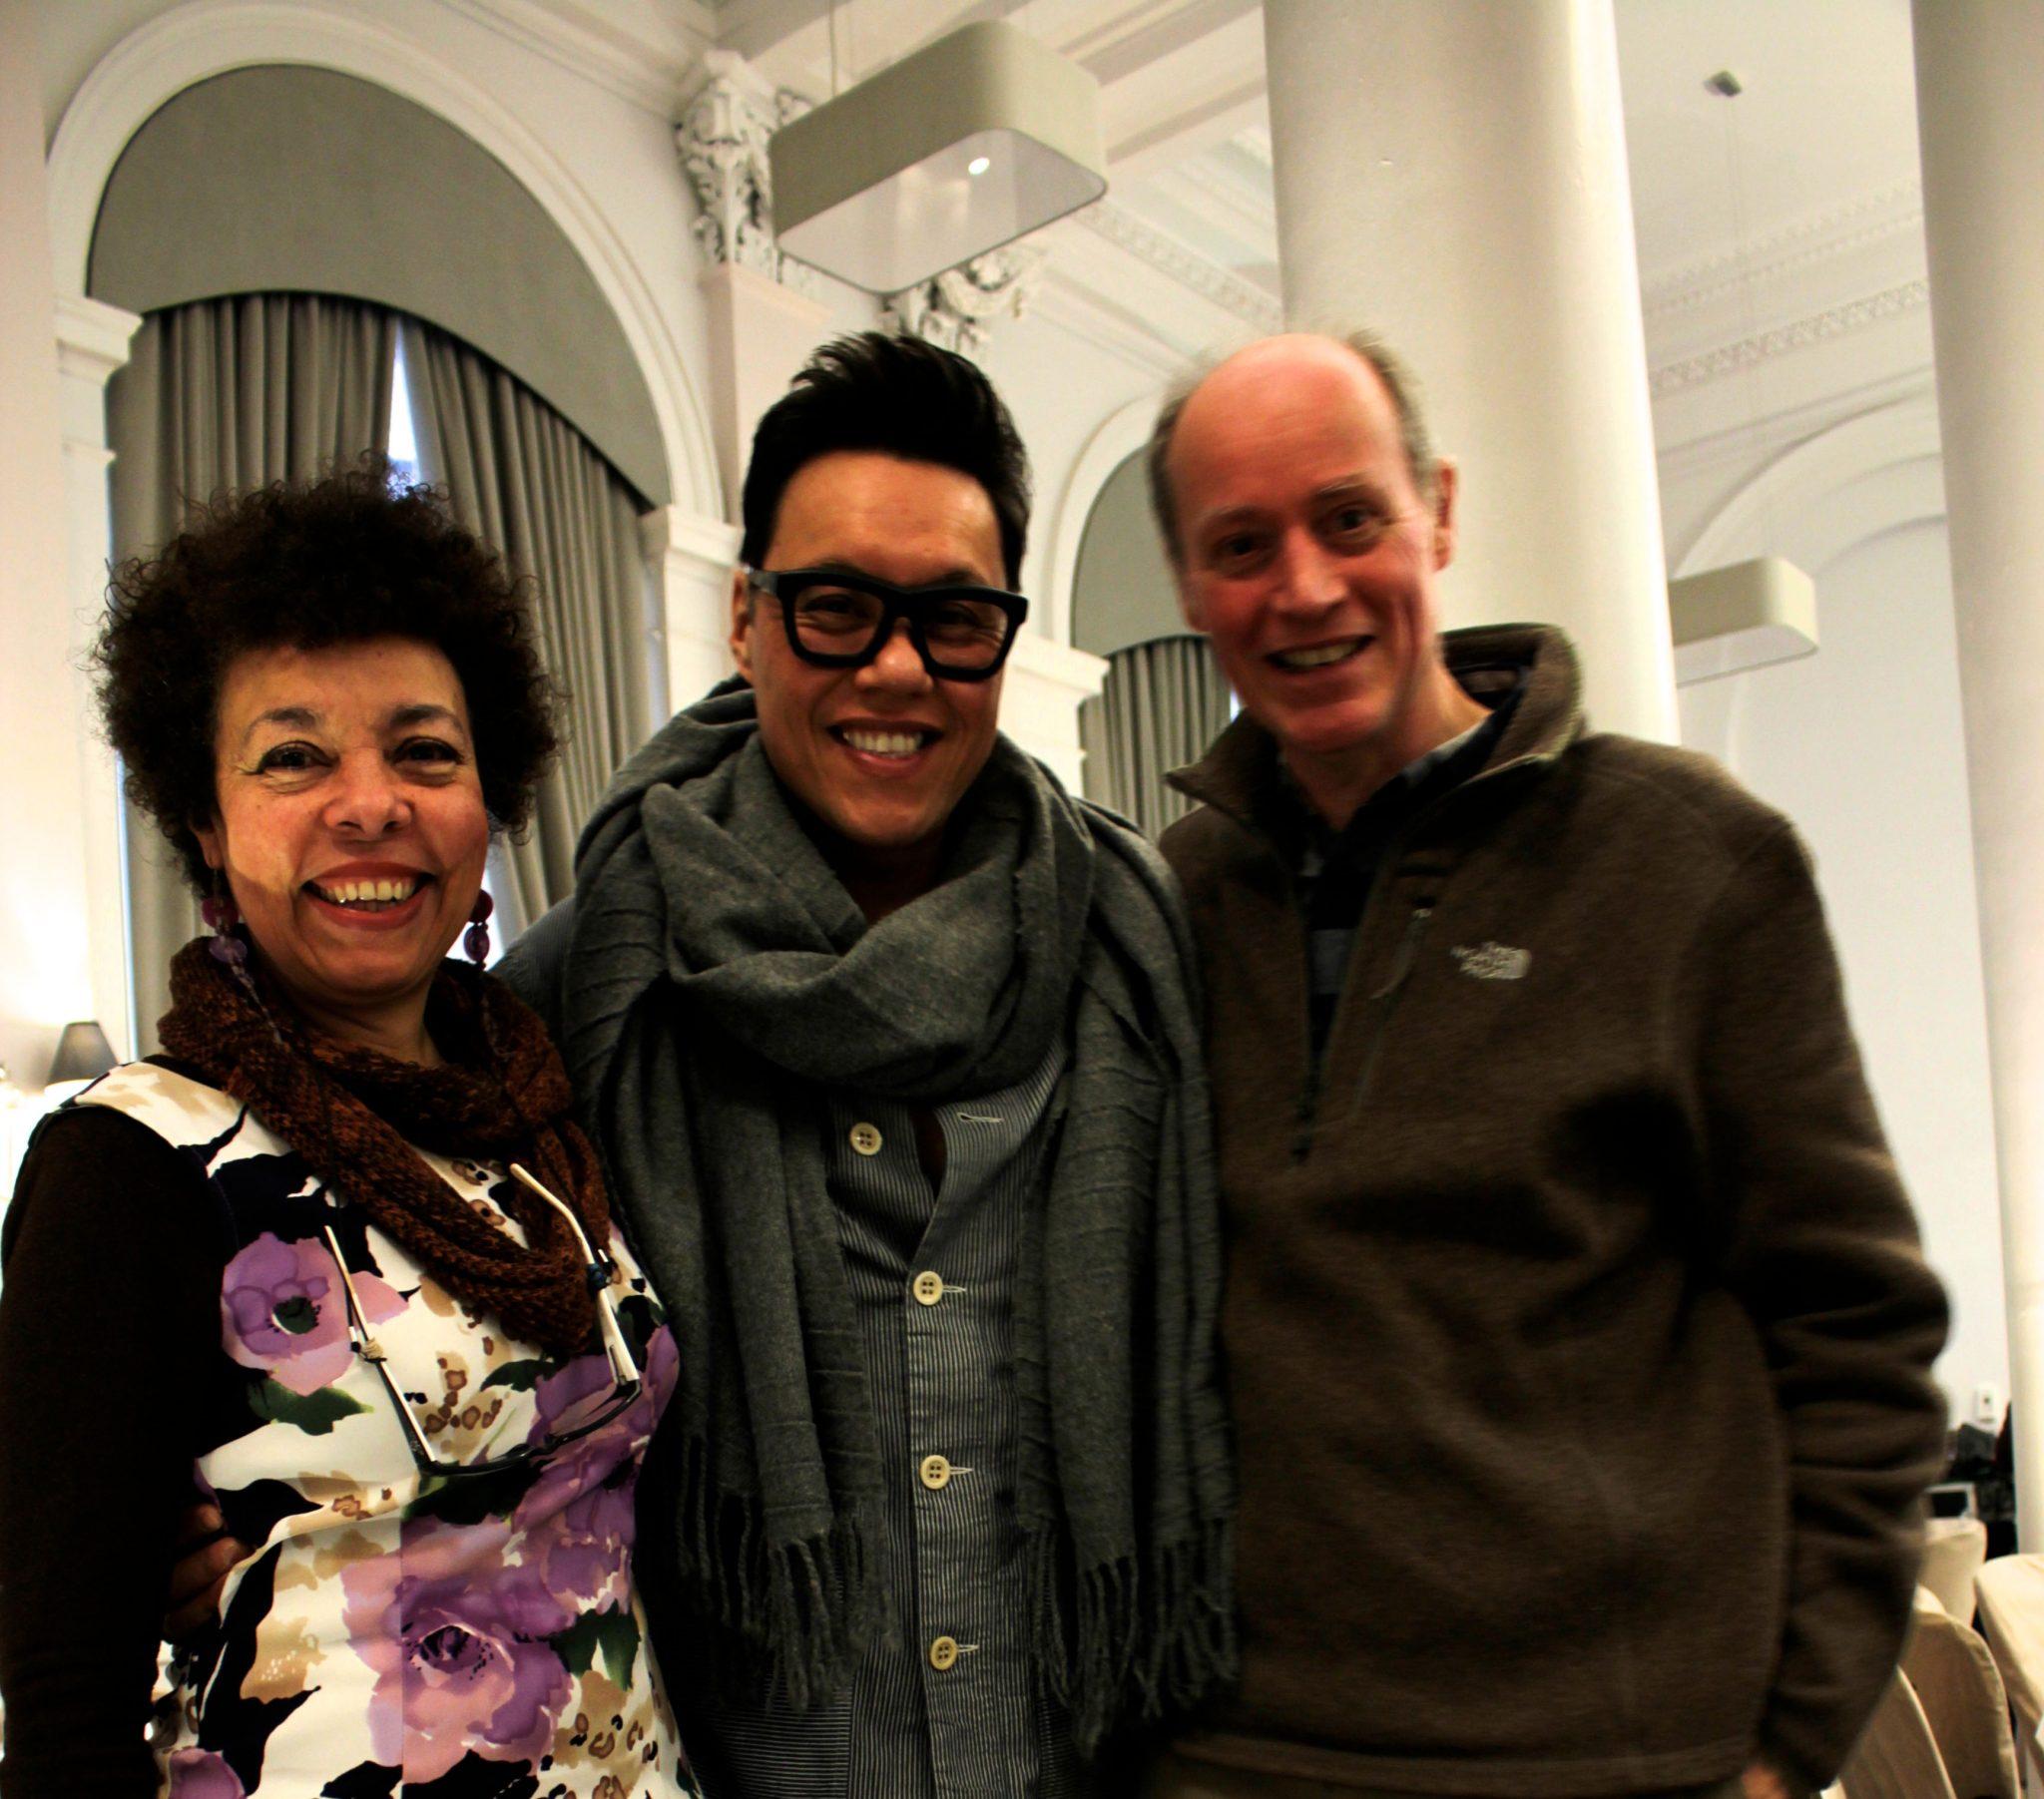 Helen, Gok Wan & Bill